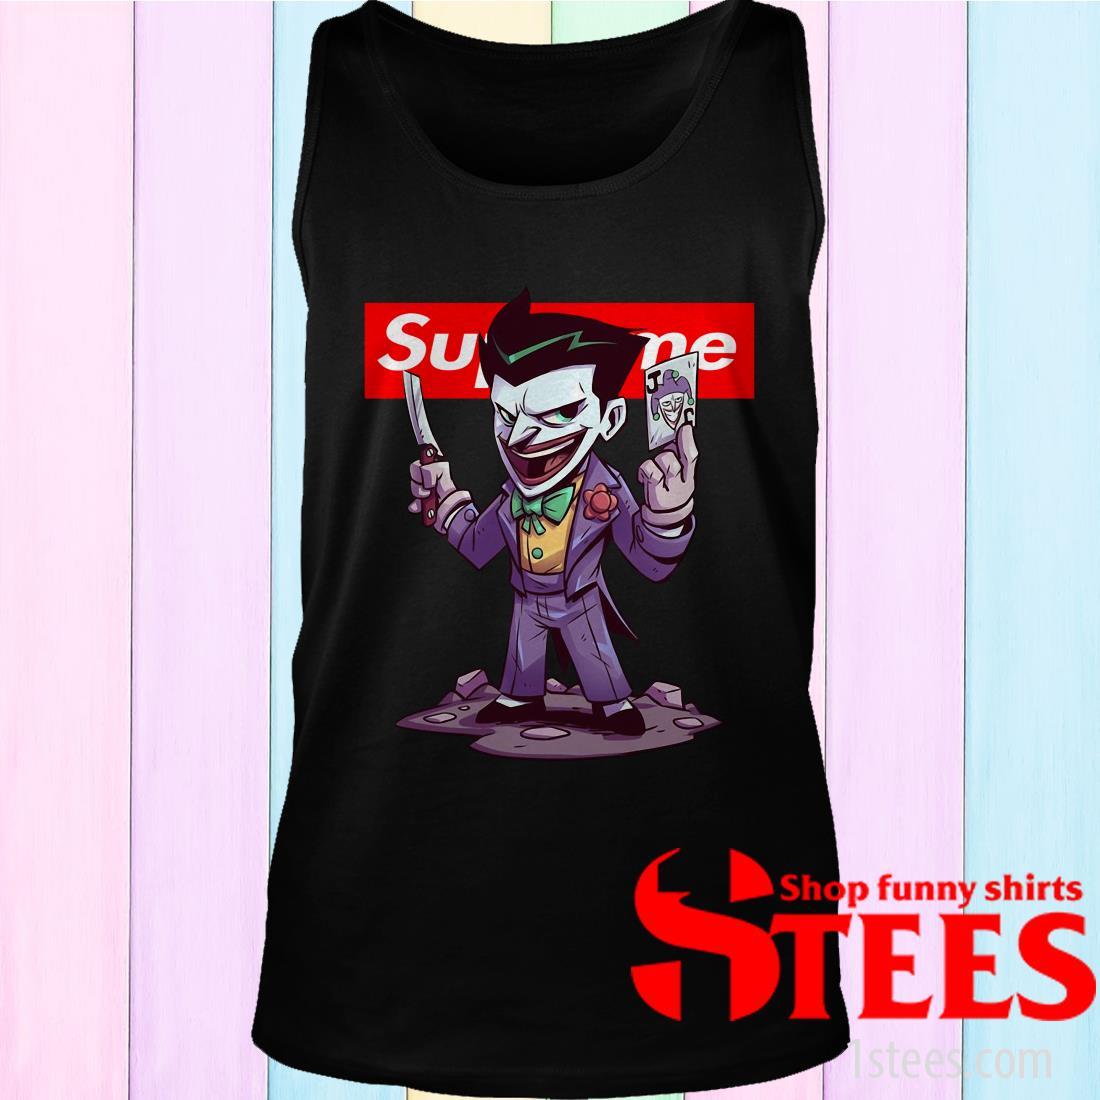 Supreme vs Gucci Joker Chibi Shirt